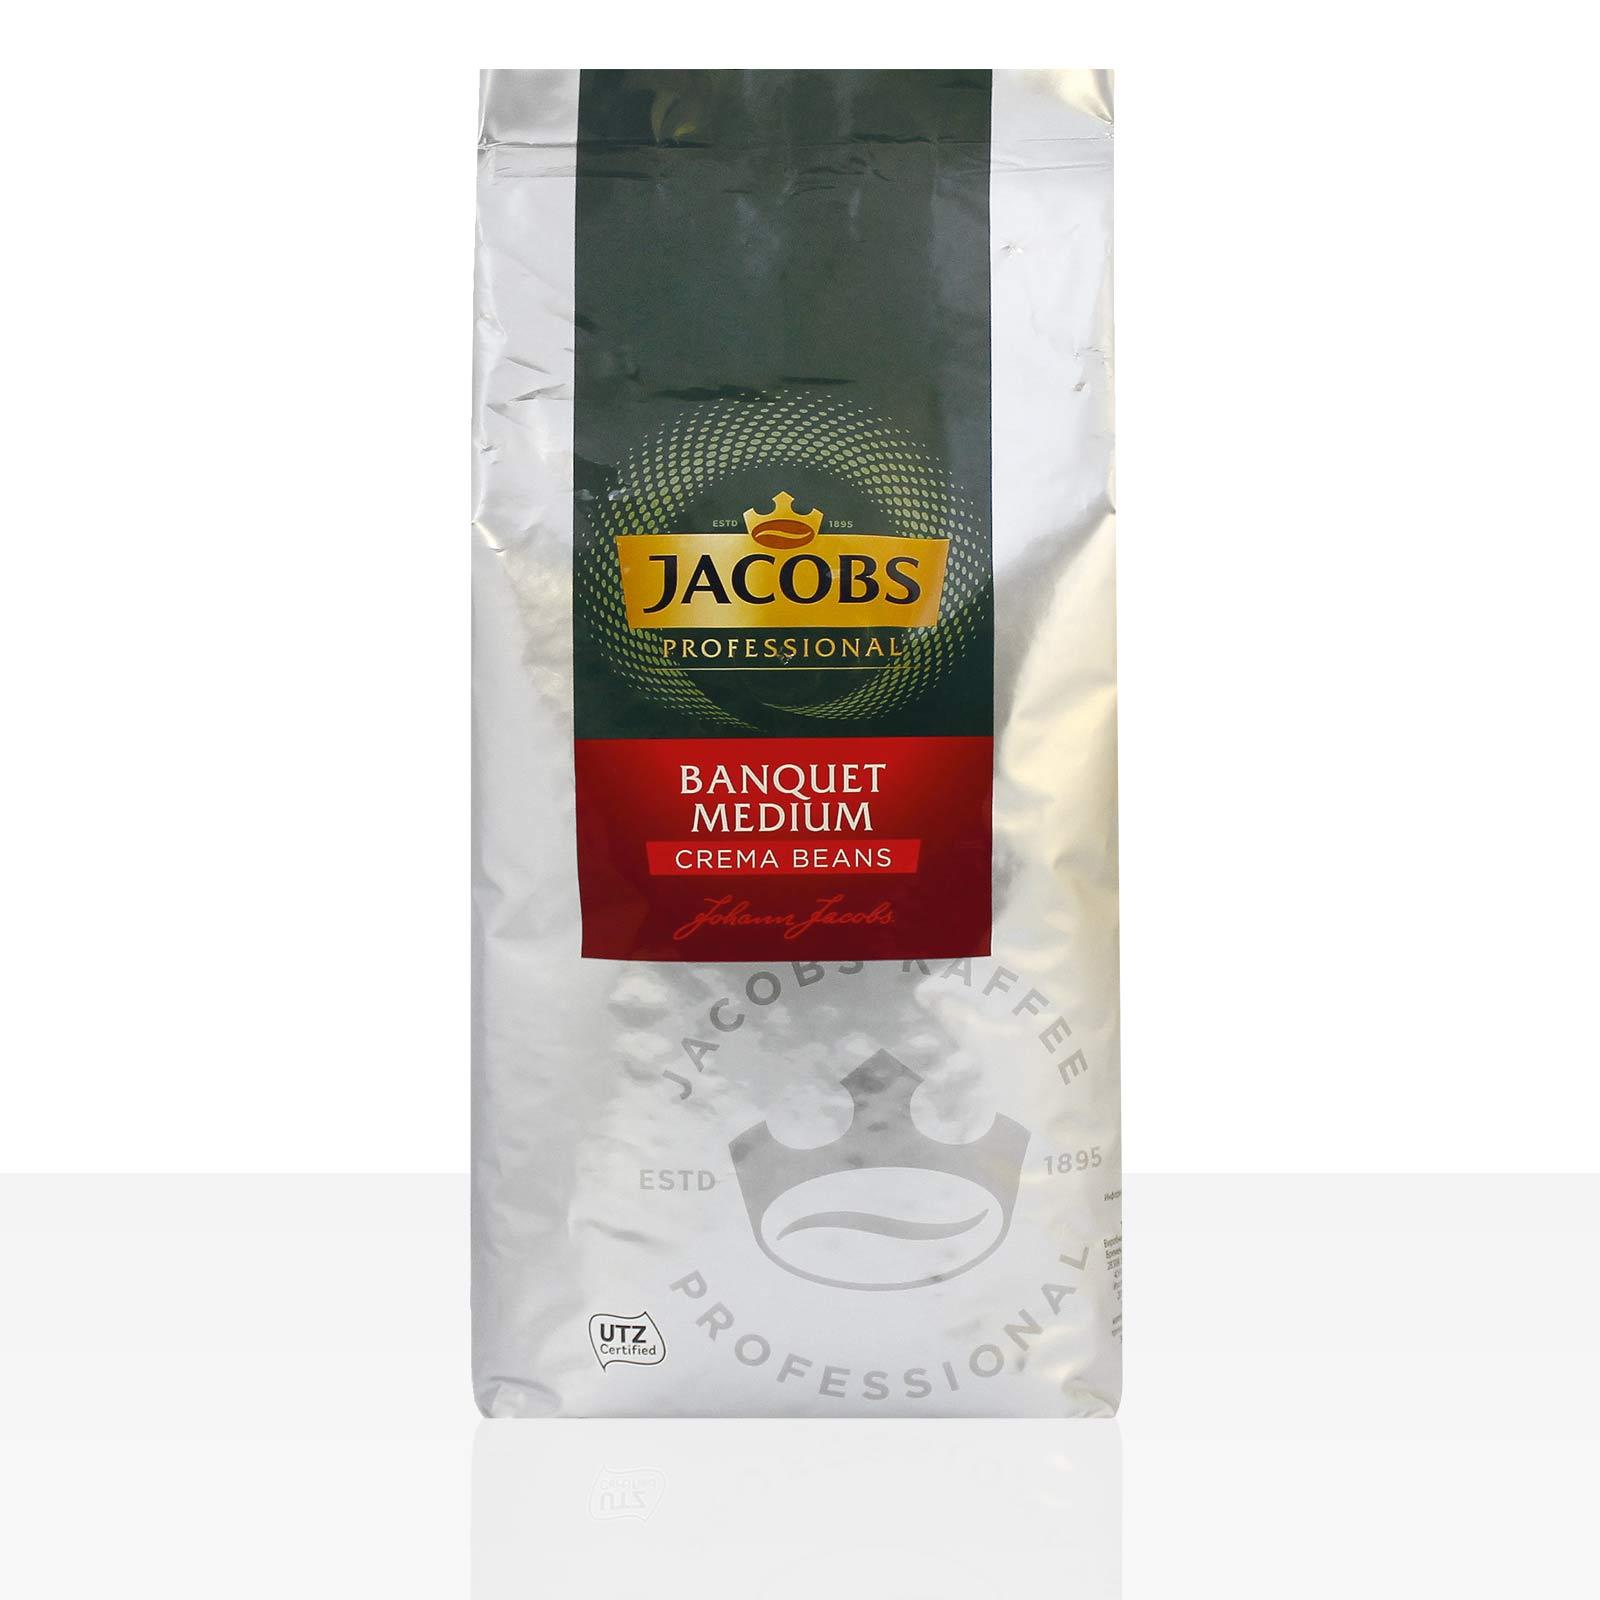 Jacobs Professional Cafe Creme Bankett Medium - 8 x 1kg ganze Kaffee-Bohne